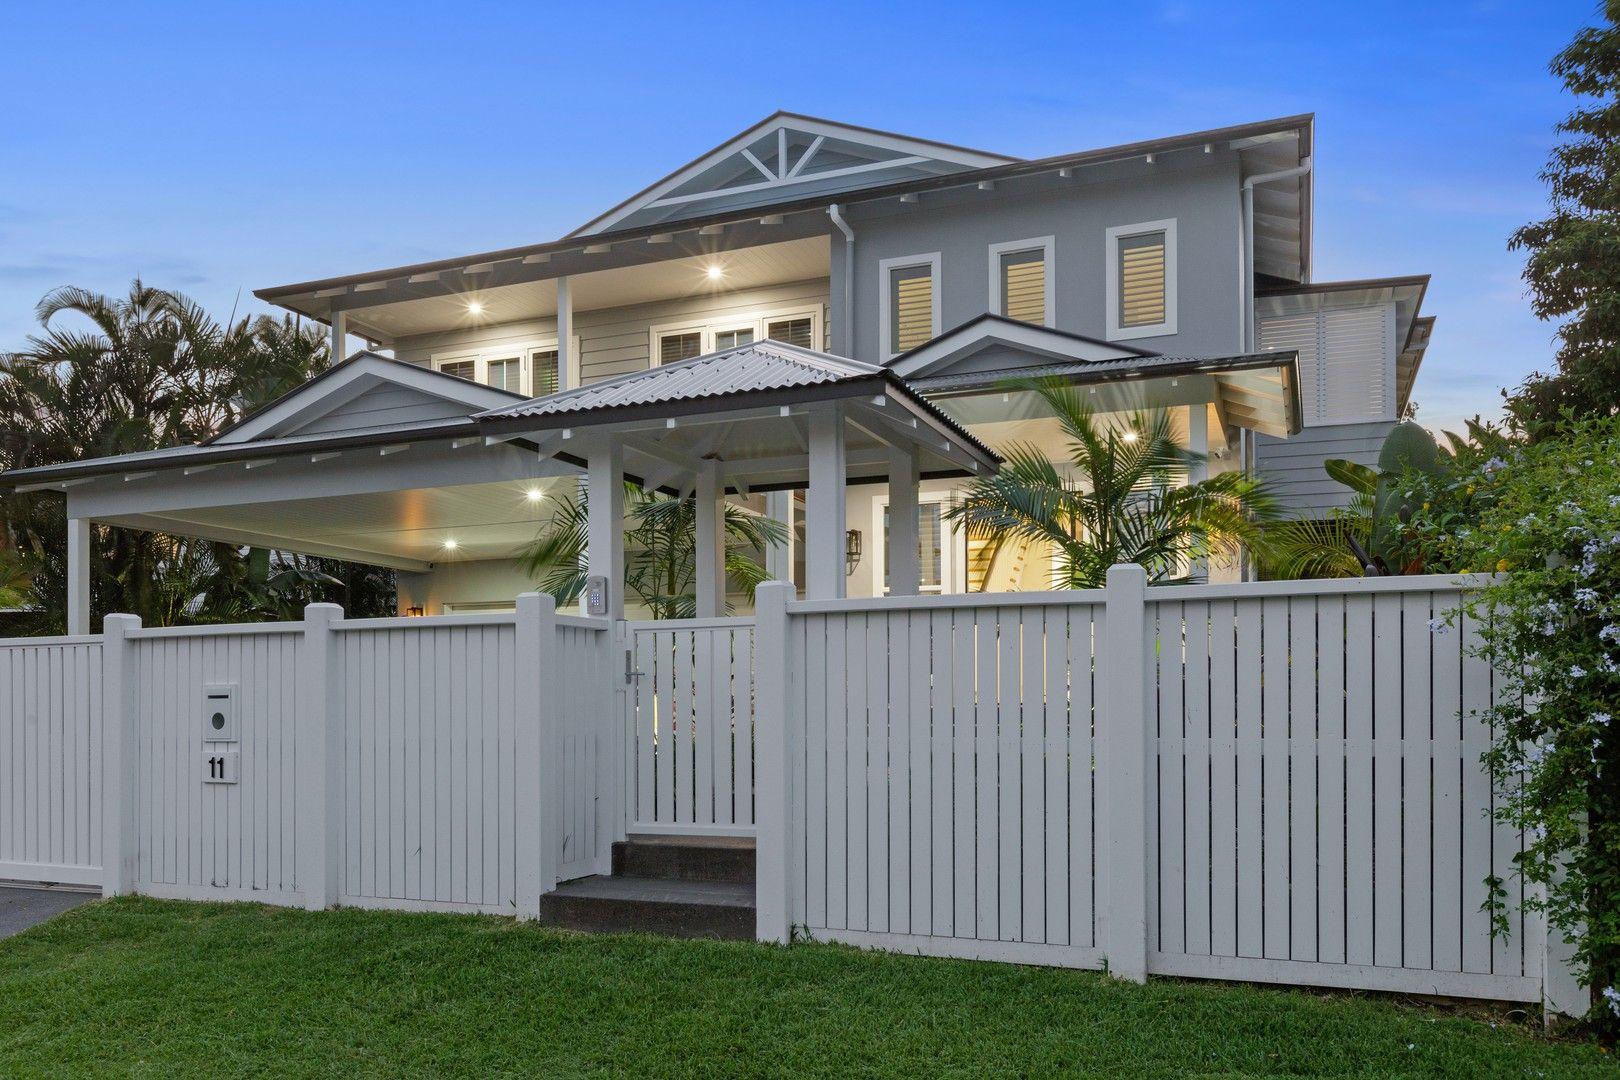 11 Jaora Street, Graceville QLD 4075, Image 1